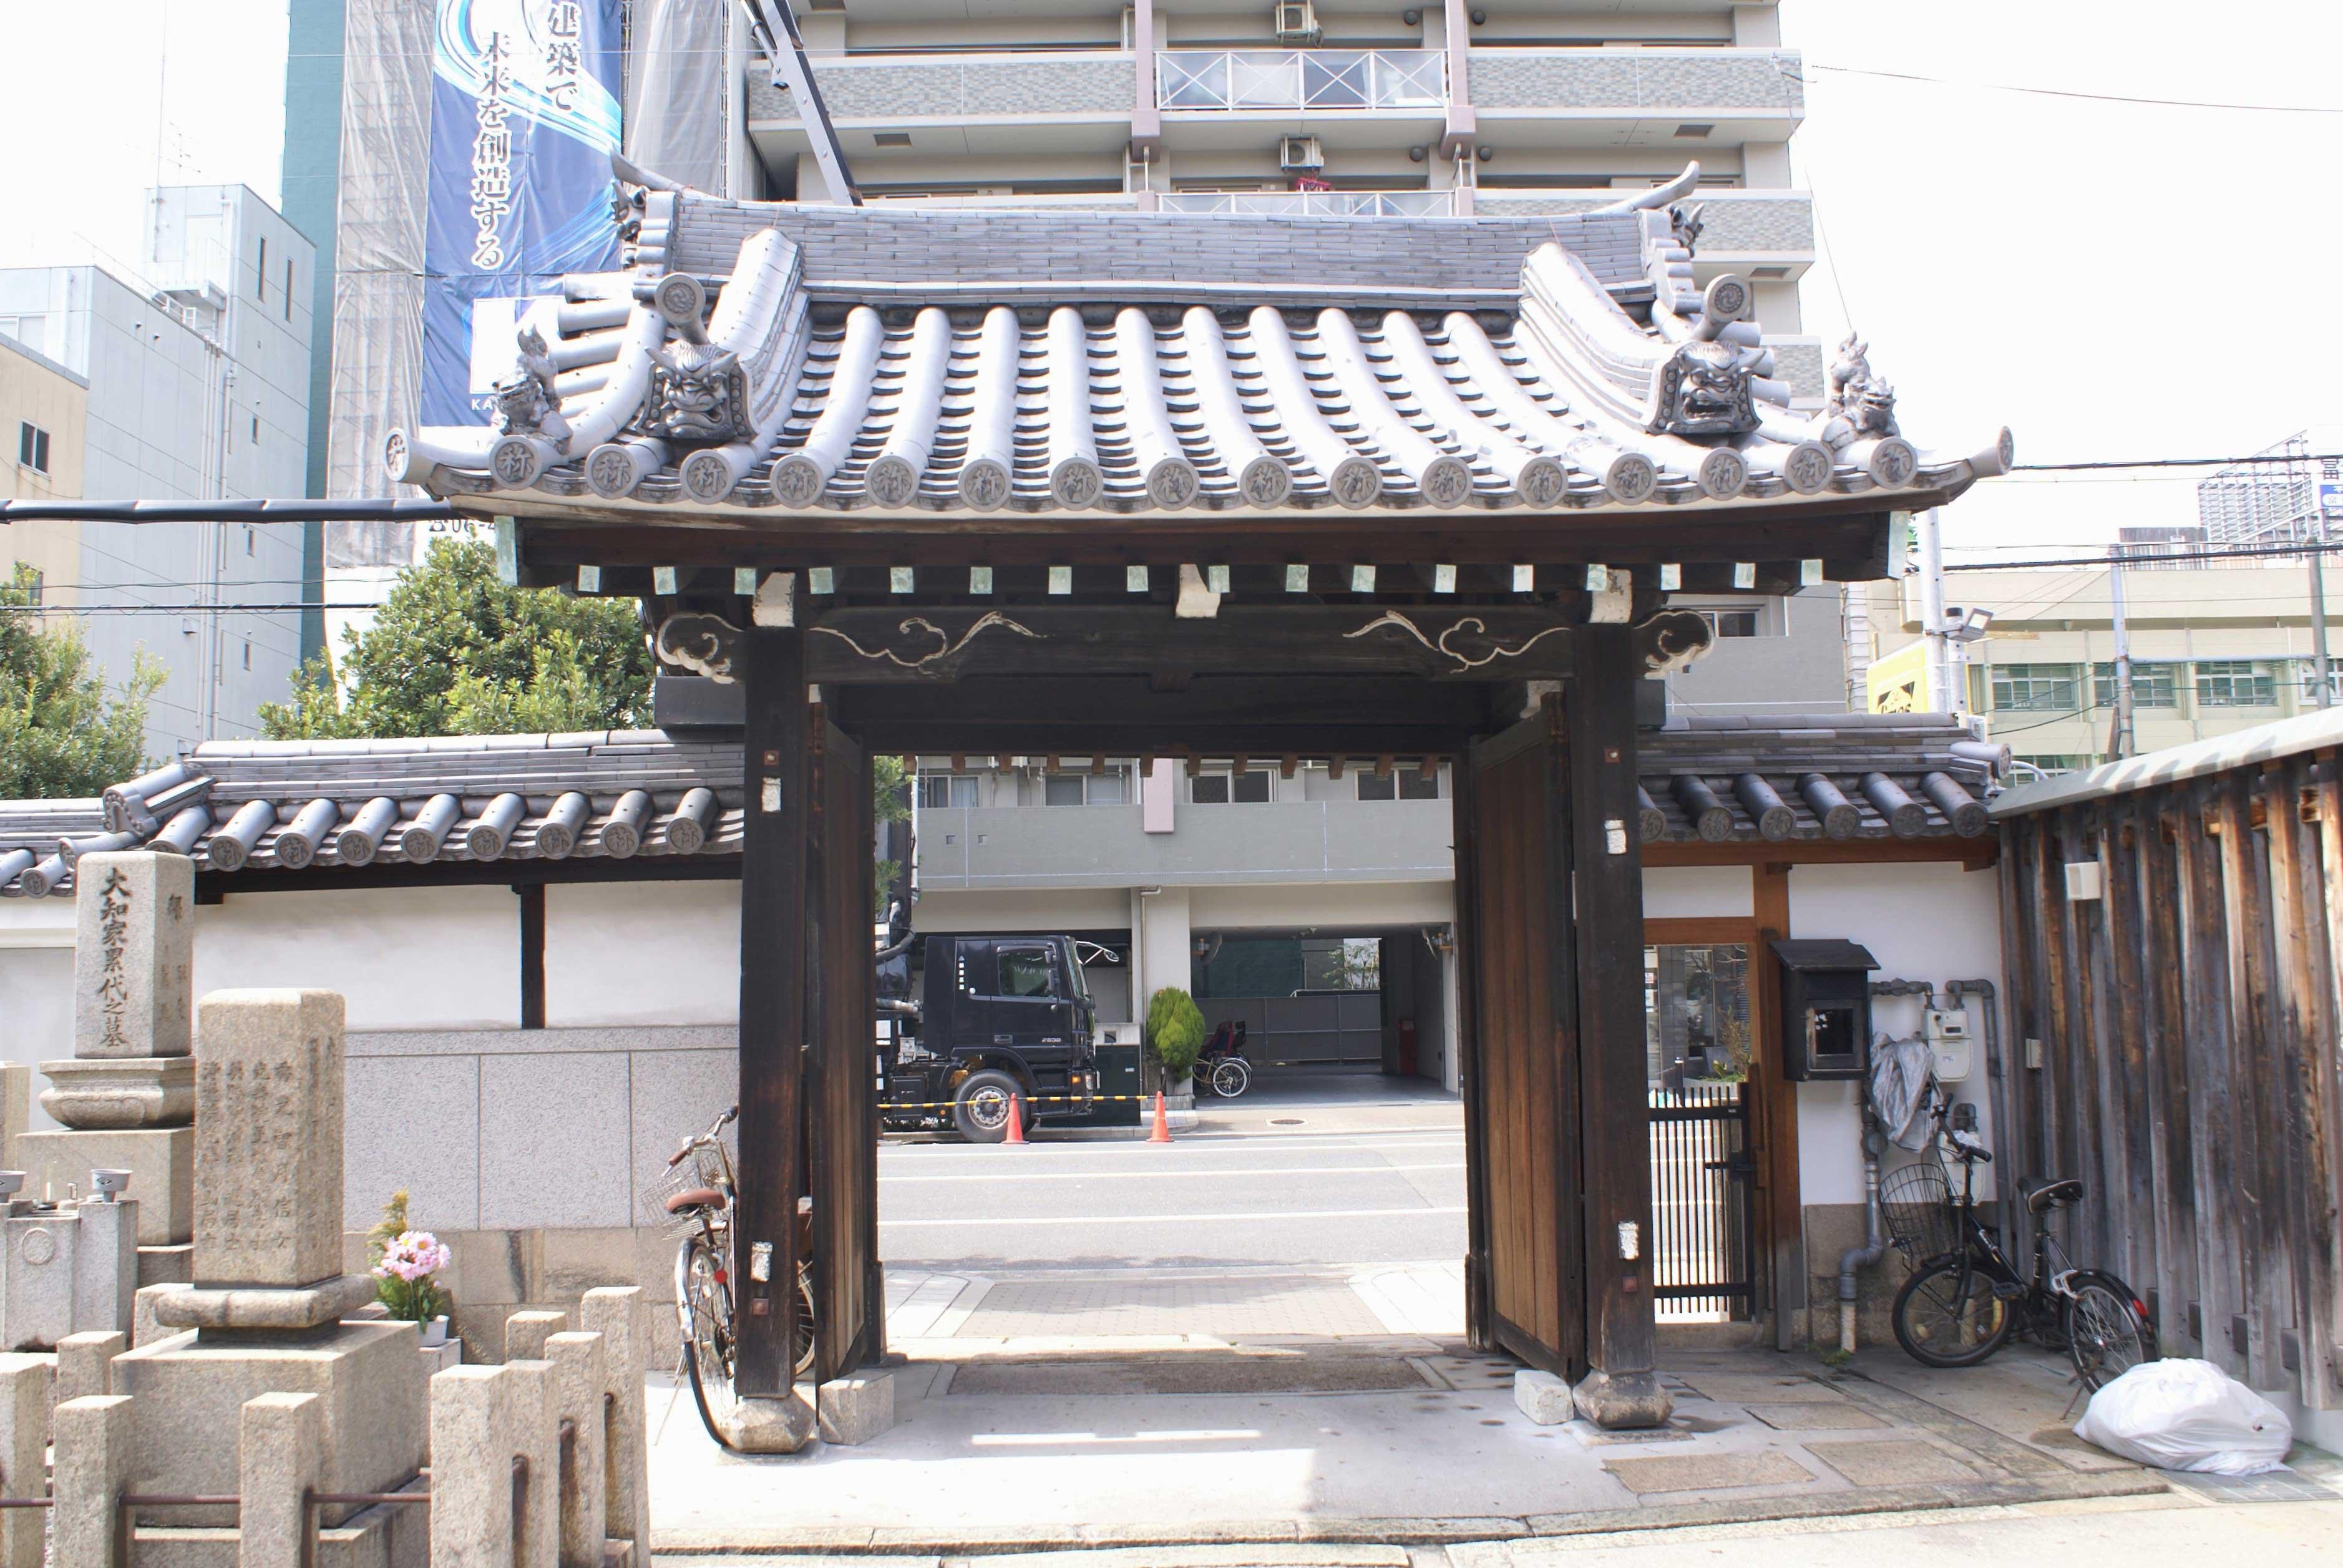 <p>由境内看山門</p>雖然装飾少,但是木鼻等細部上可見江戸中期的意匠